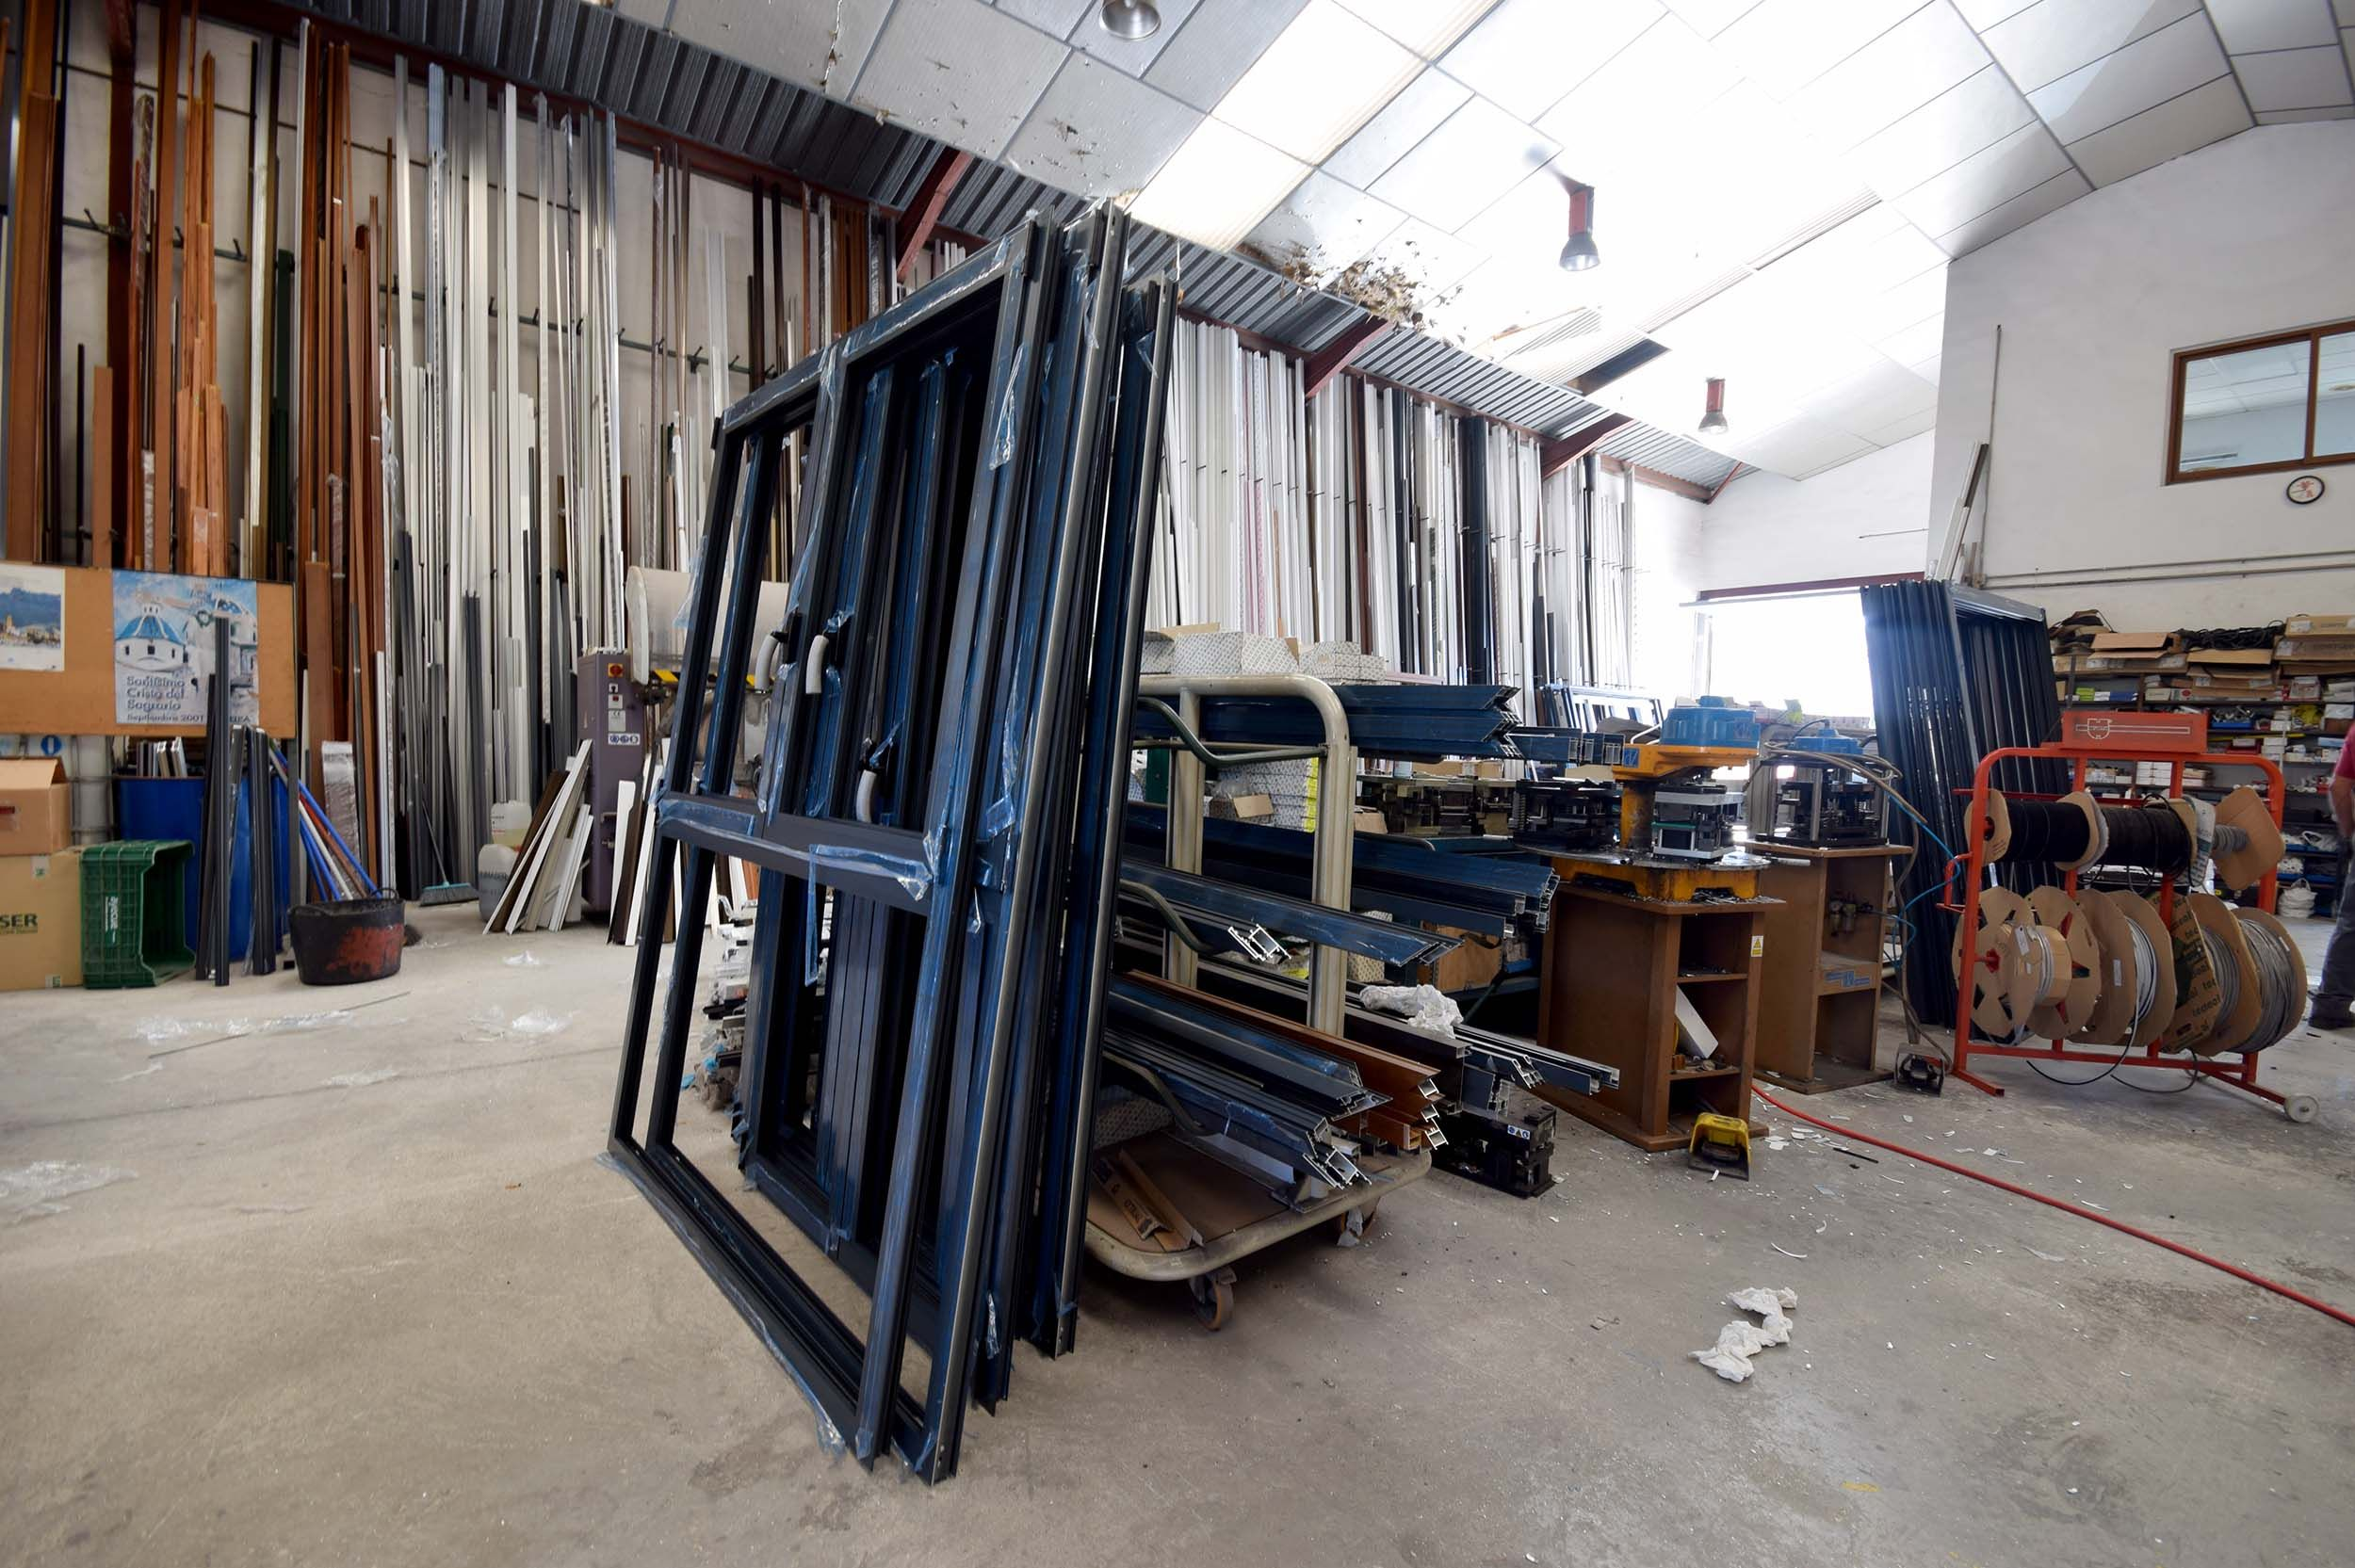 Carpintería de aluminio en general en Calpe